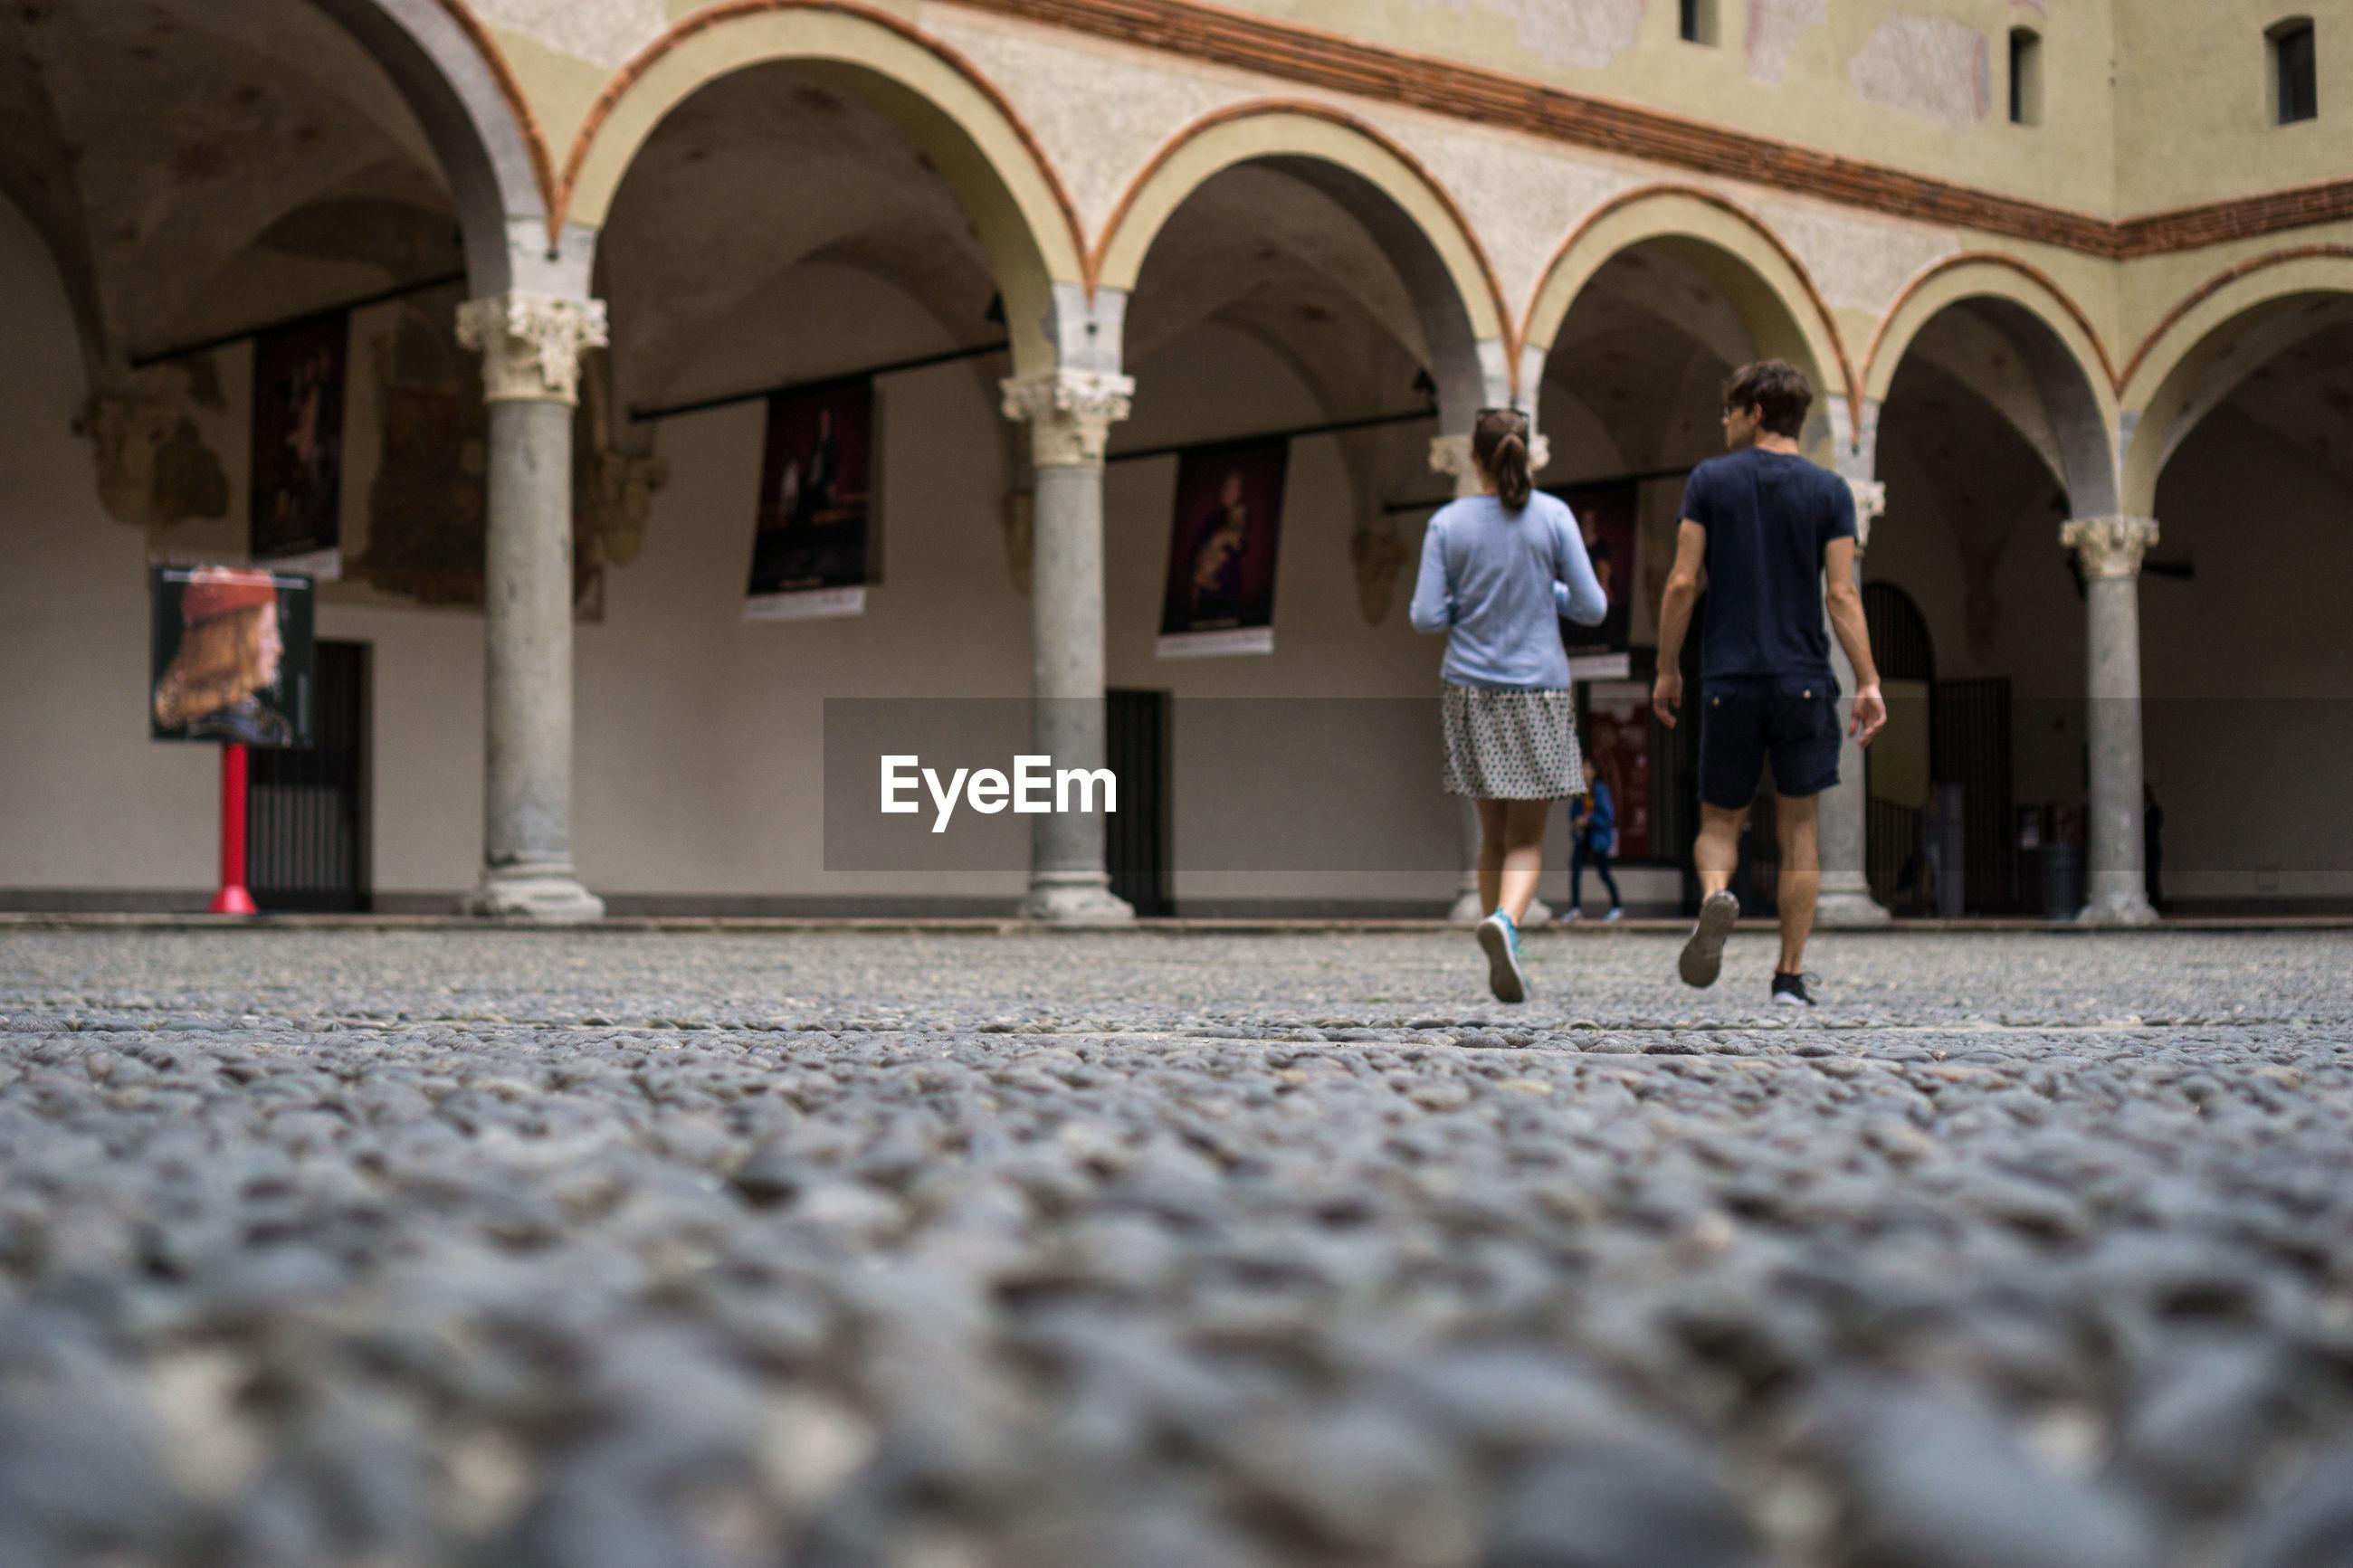 Rear view of tourist walking in courtyard in castello sforzesco